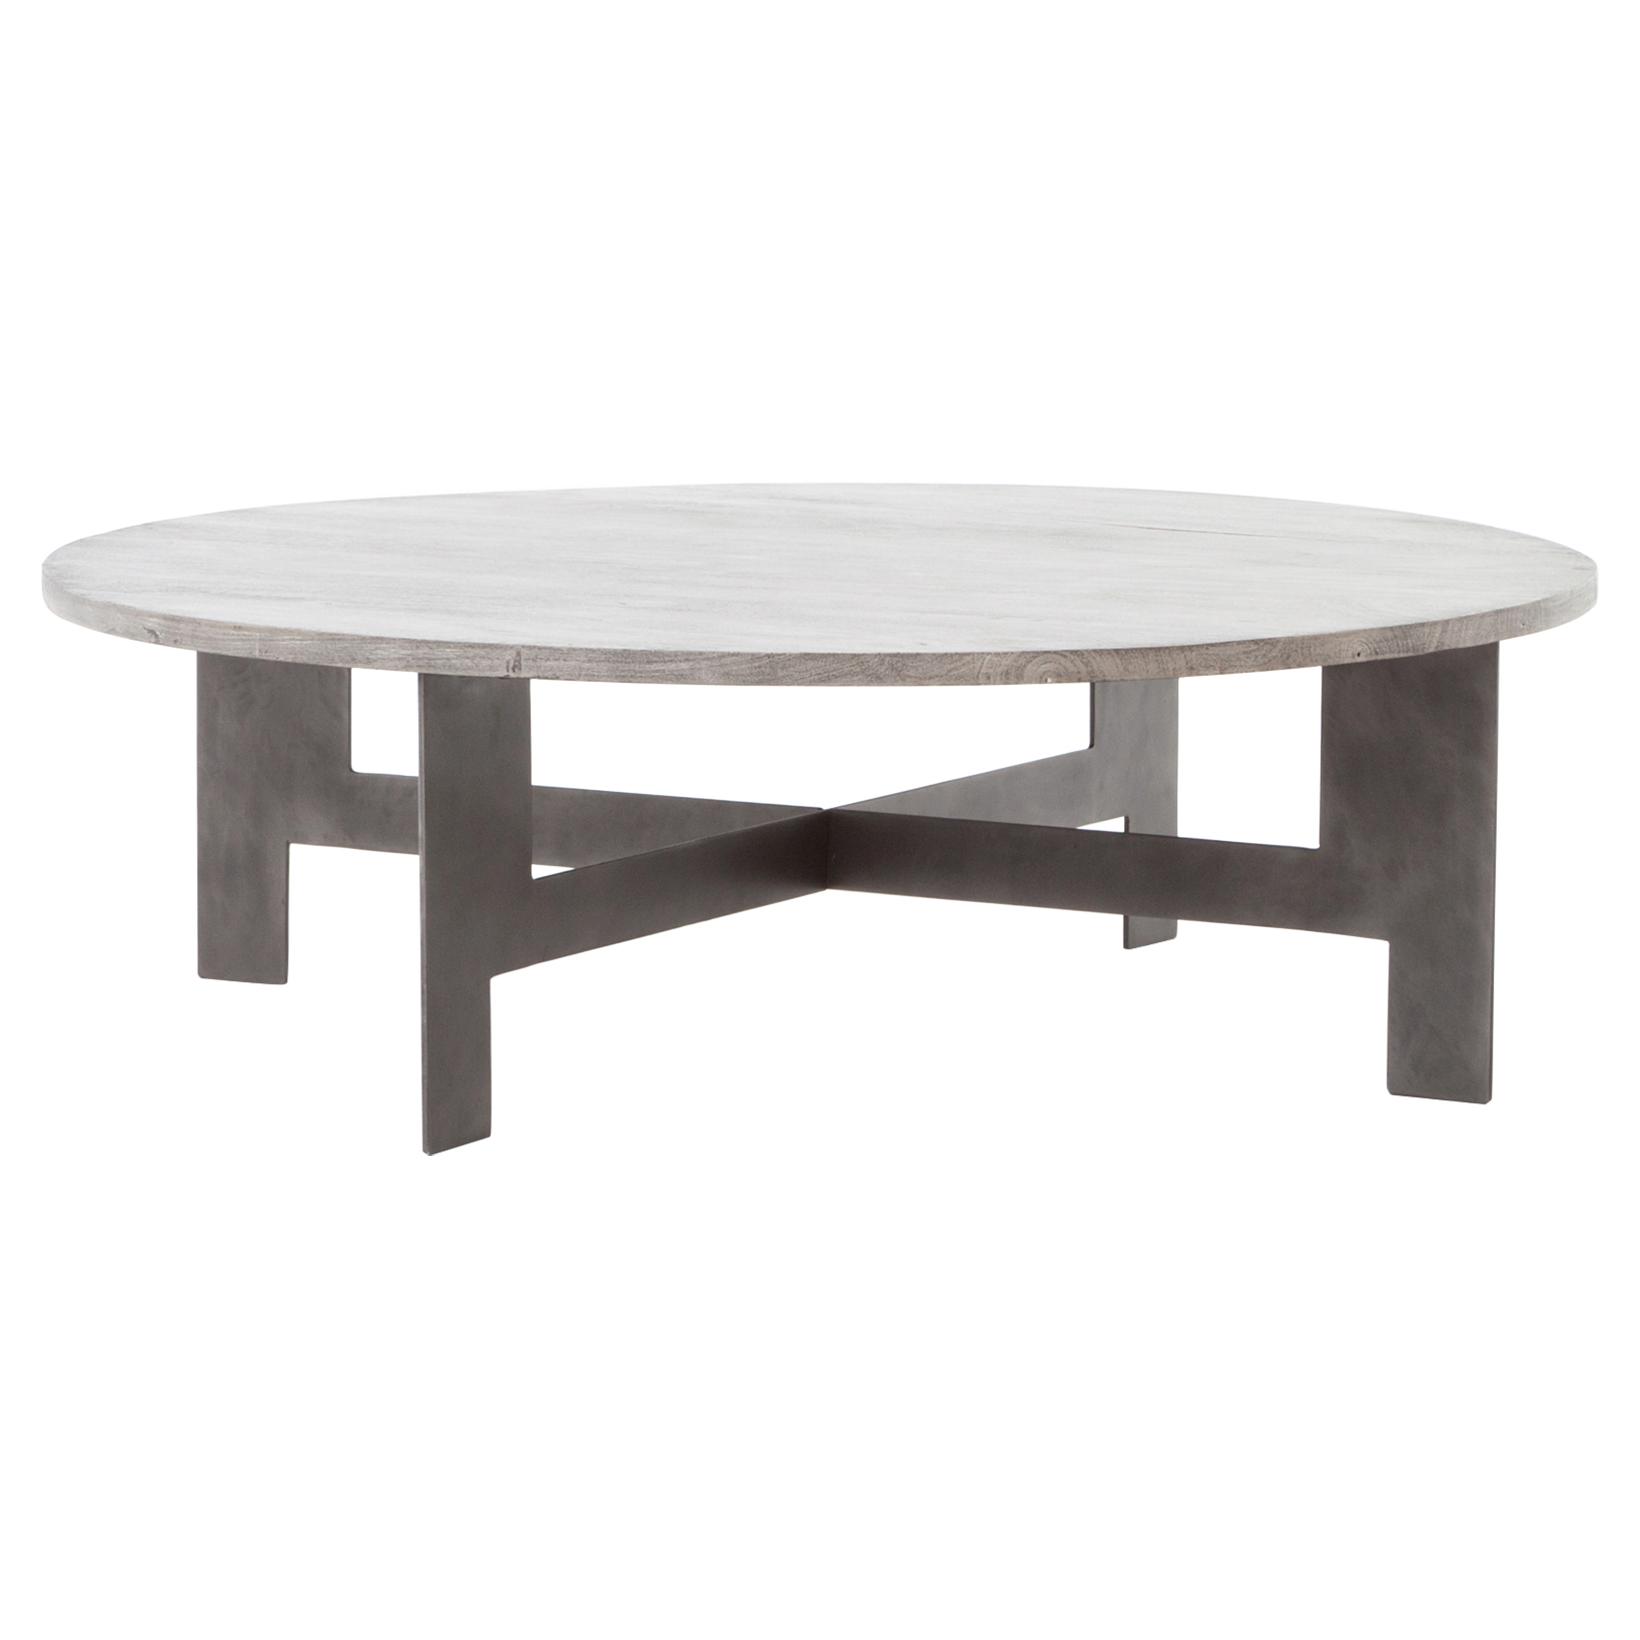 Ingo Industrial Loft Grey Wood Iron Round Coffee Table